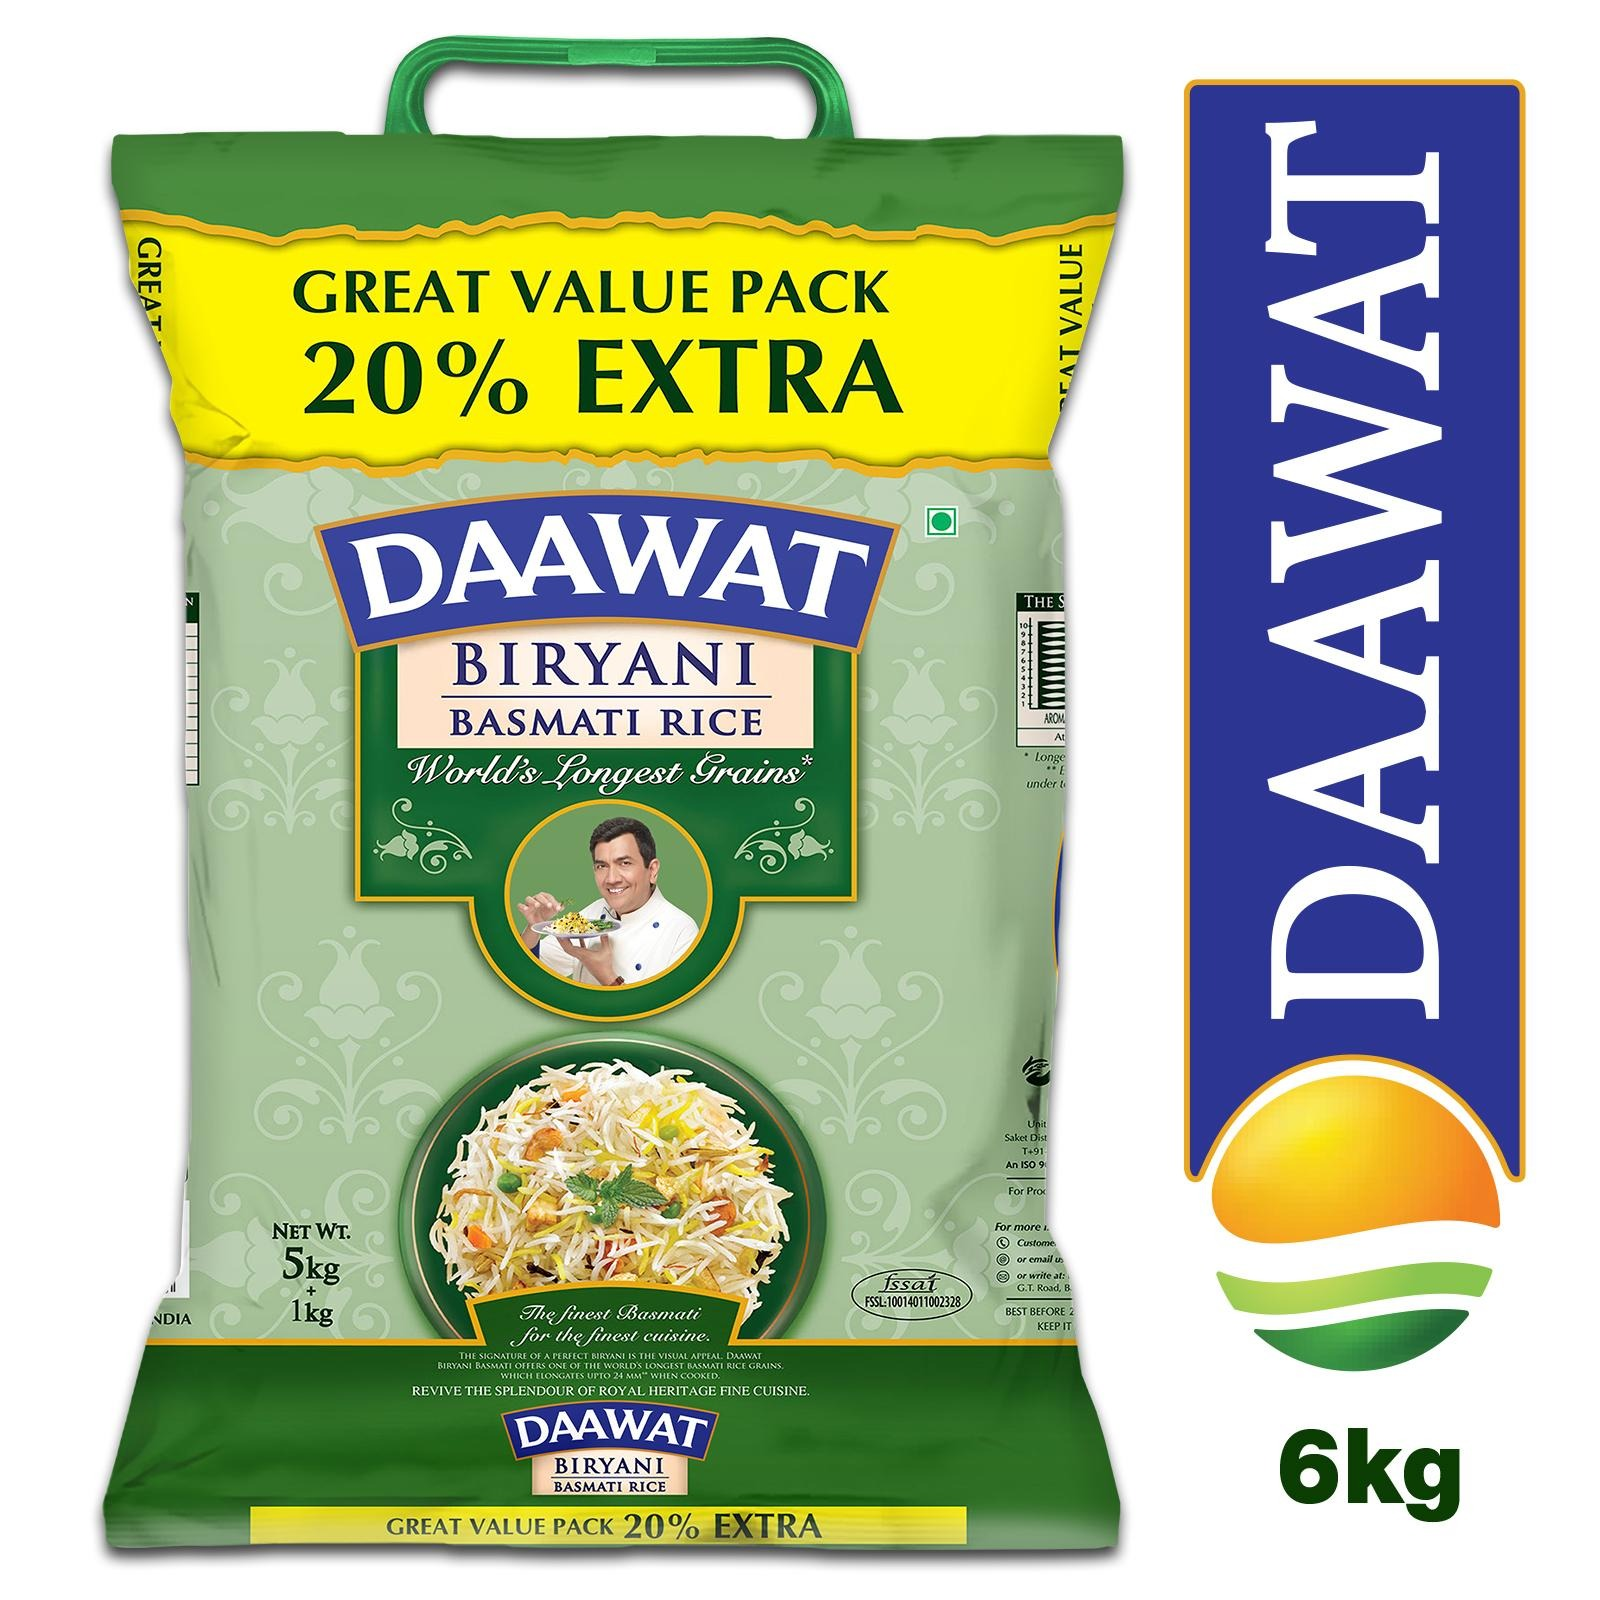 Daawat Biryani Basmati Rice - By Sonnamera